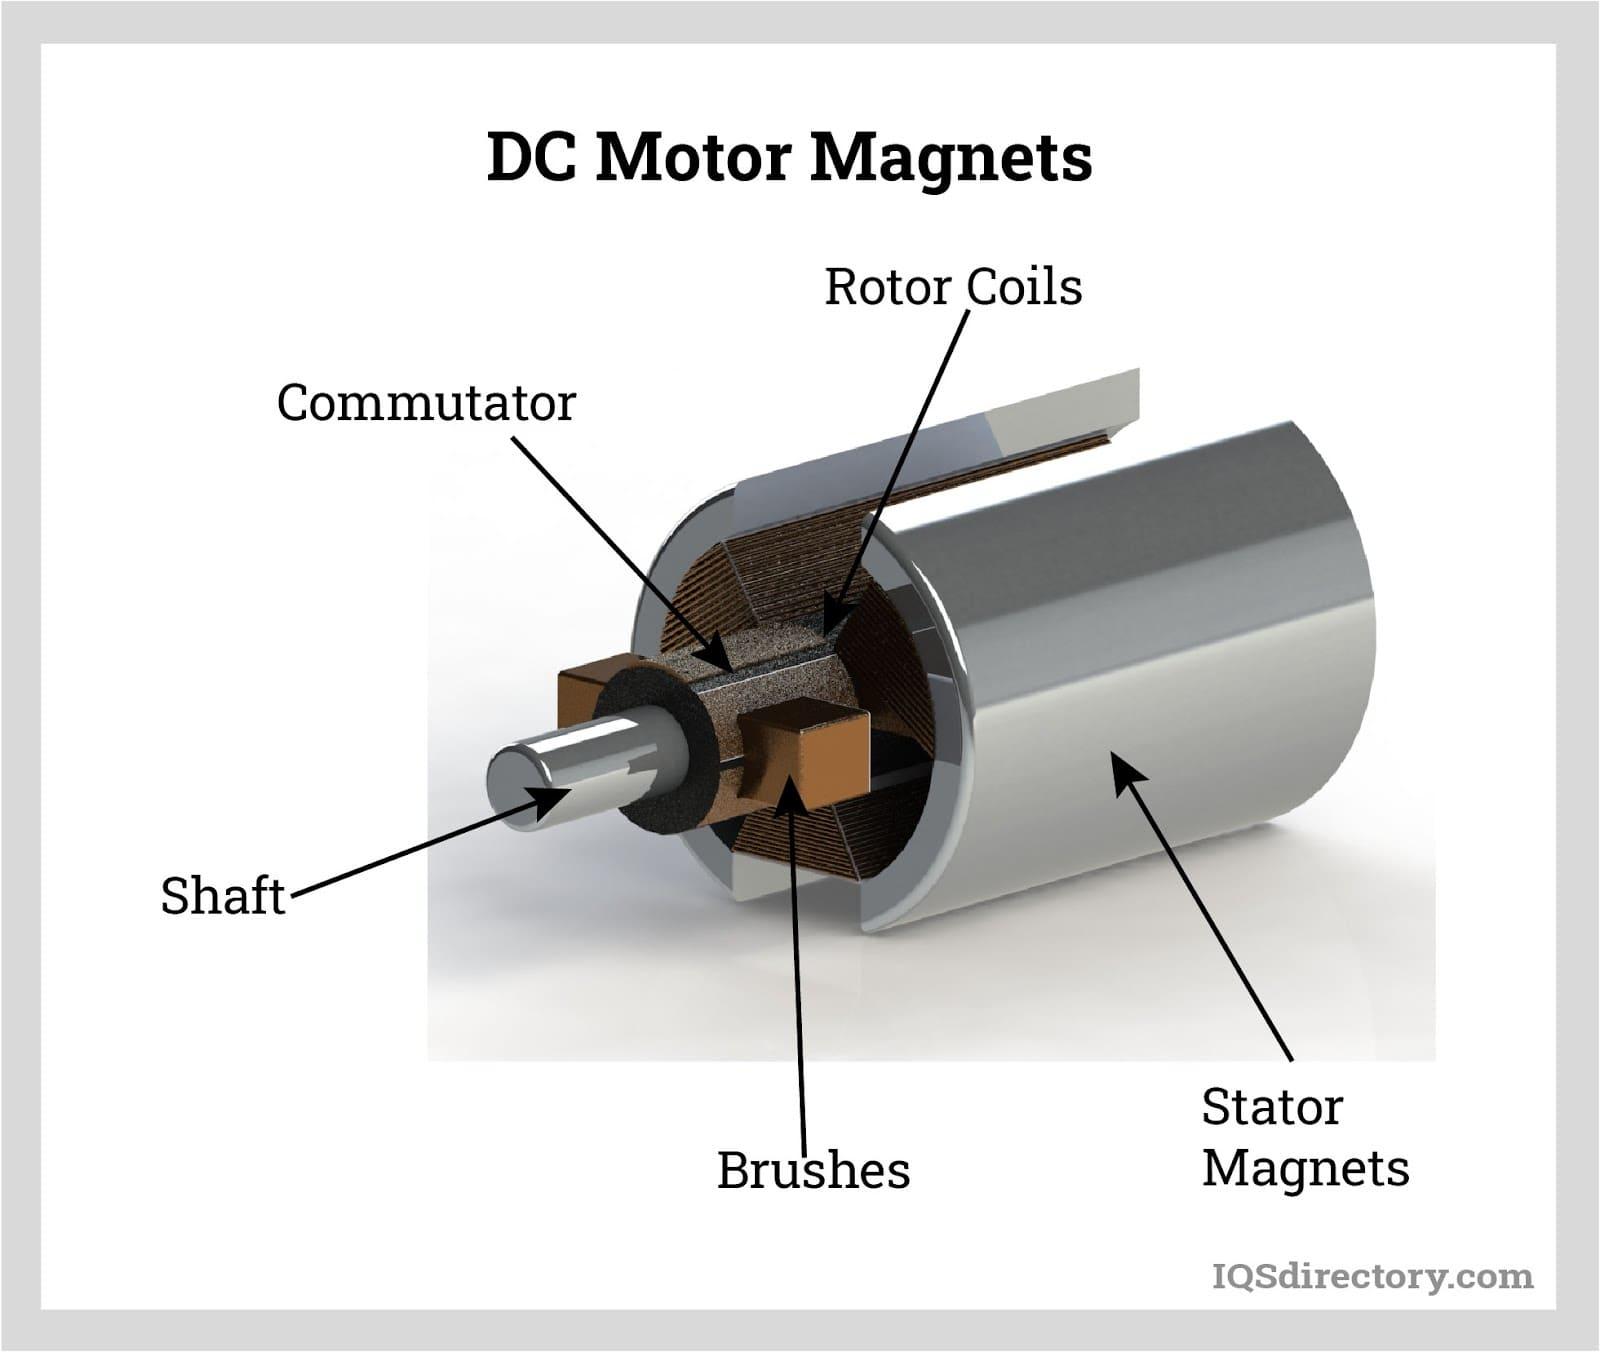 DC Motor Magnets